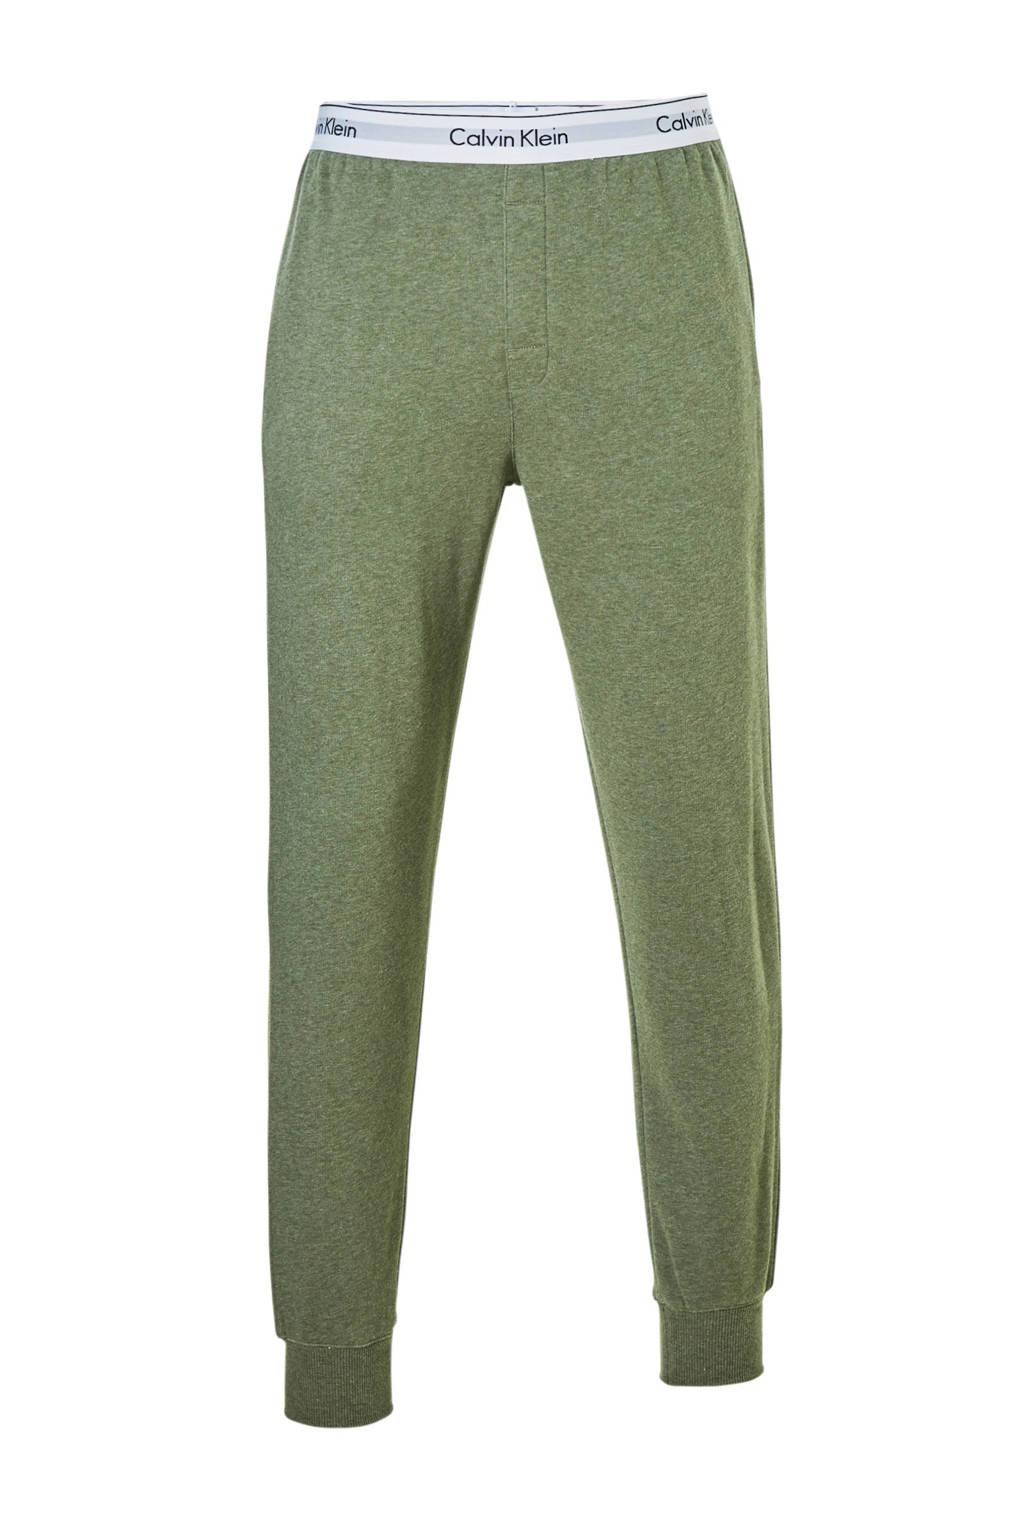 Calvin Klein sweatpants groen mêlee, Groen mêlee